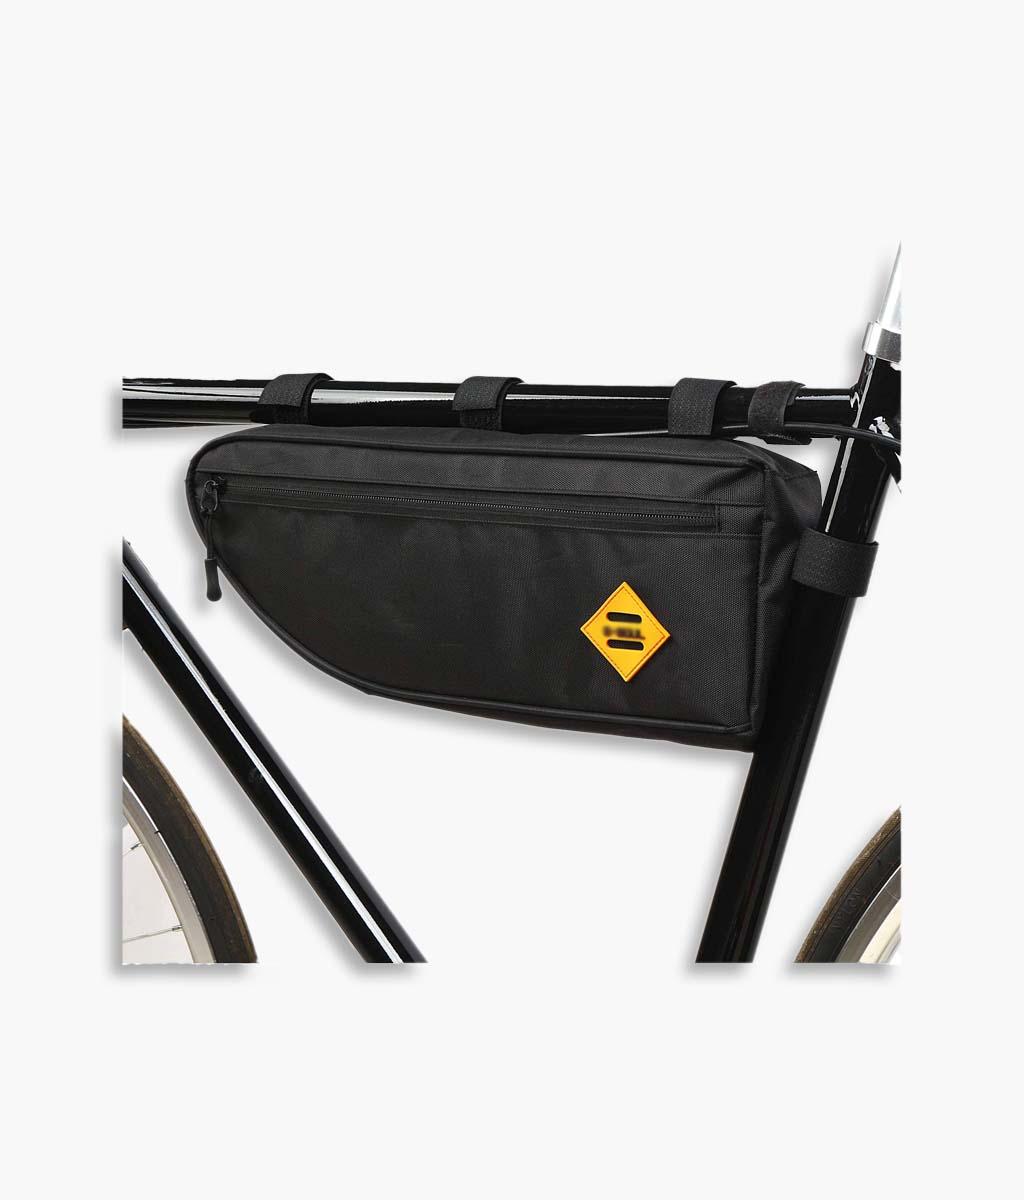 Bicycle Triangle Frame Storage Bag